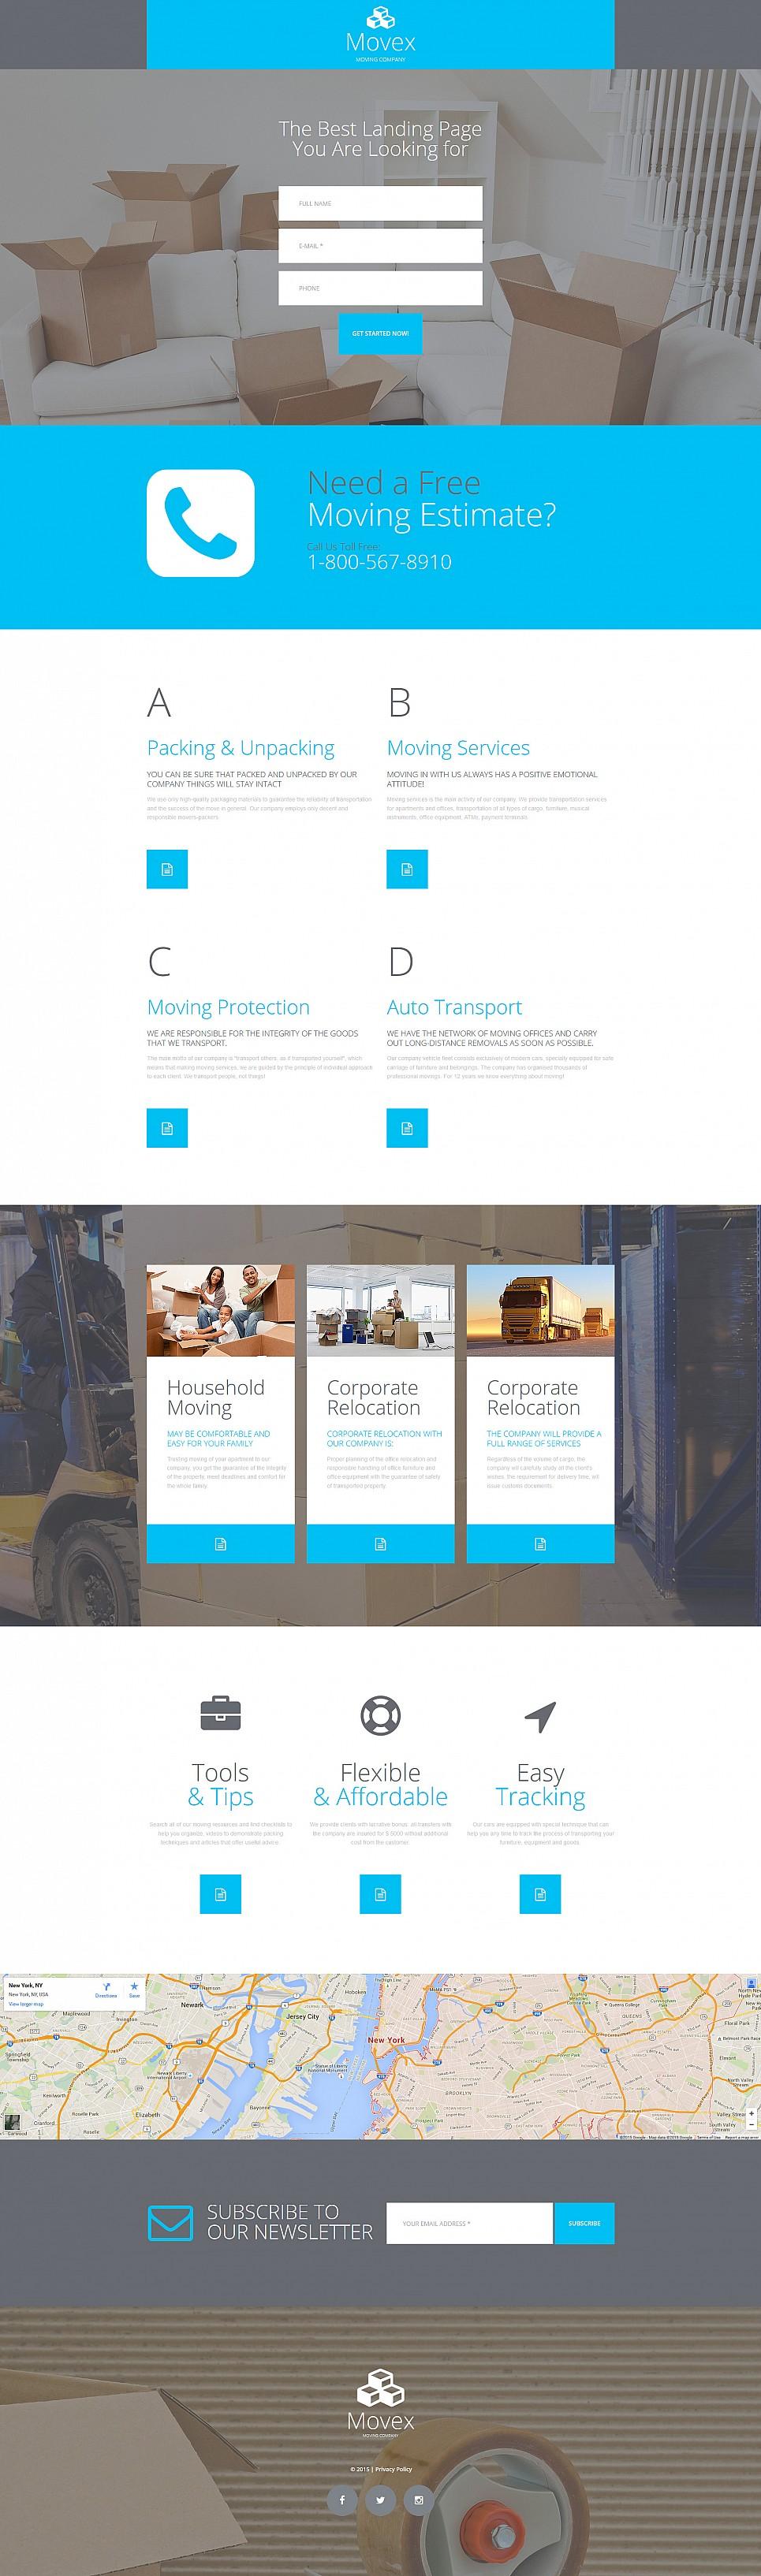 Шаблон для сайта компании по грузоперевозкам - image